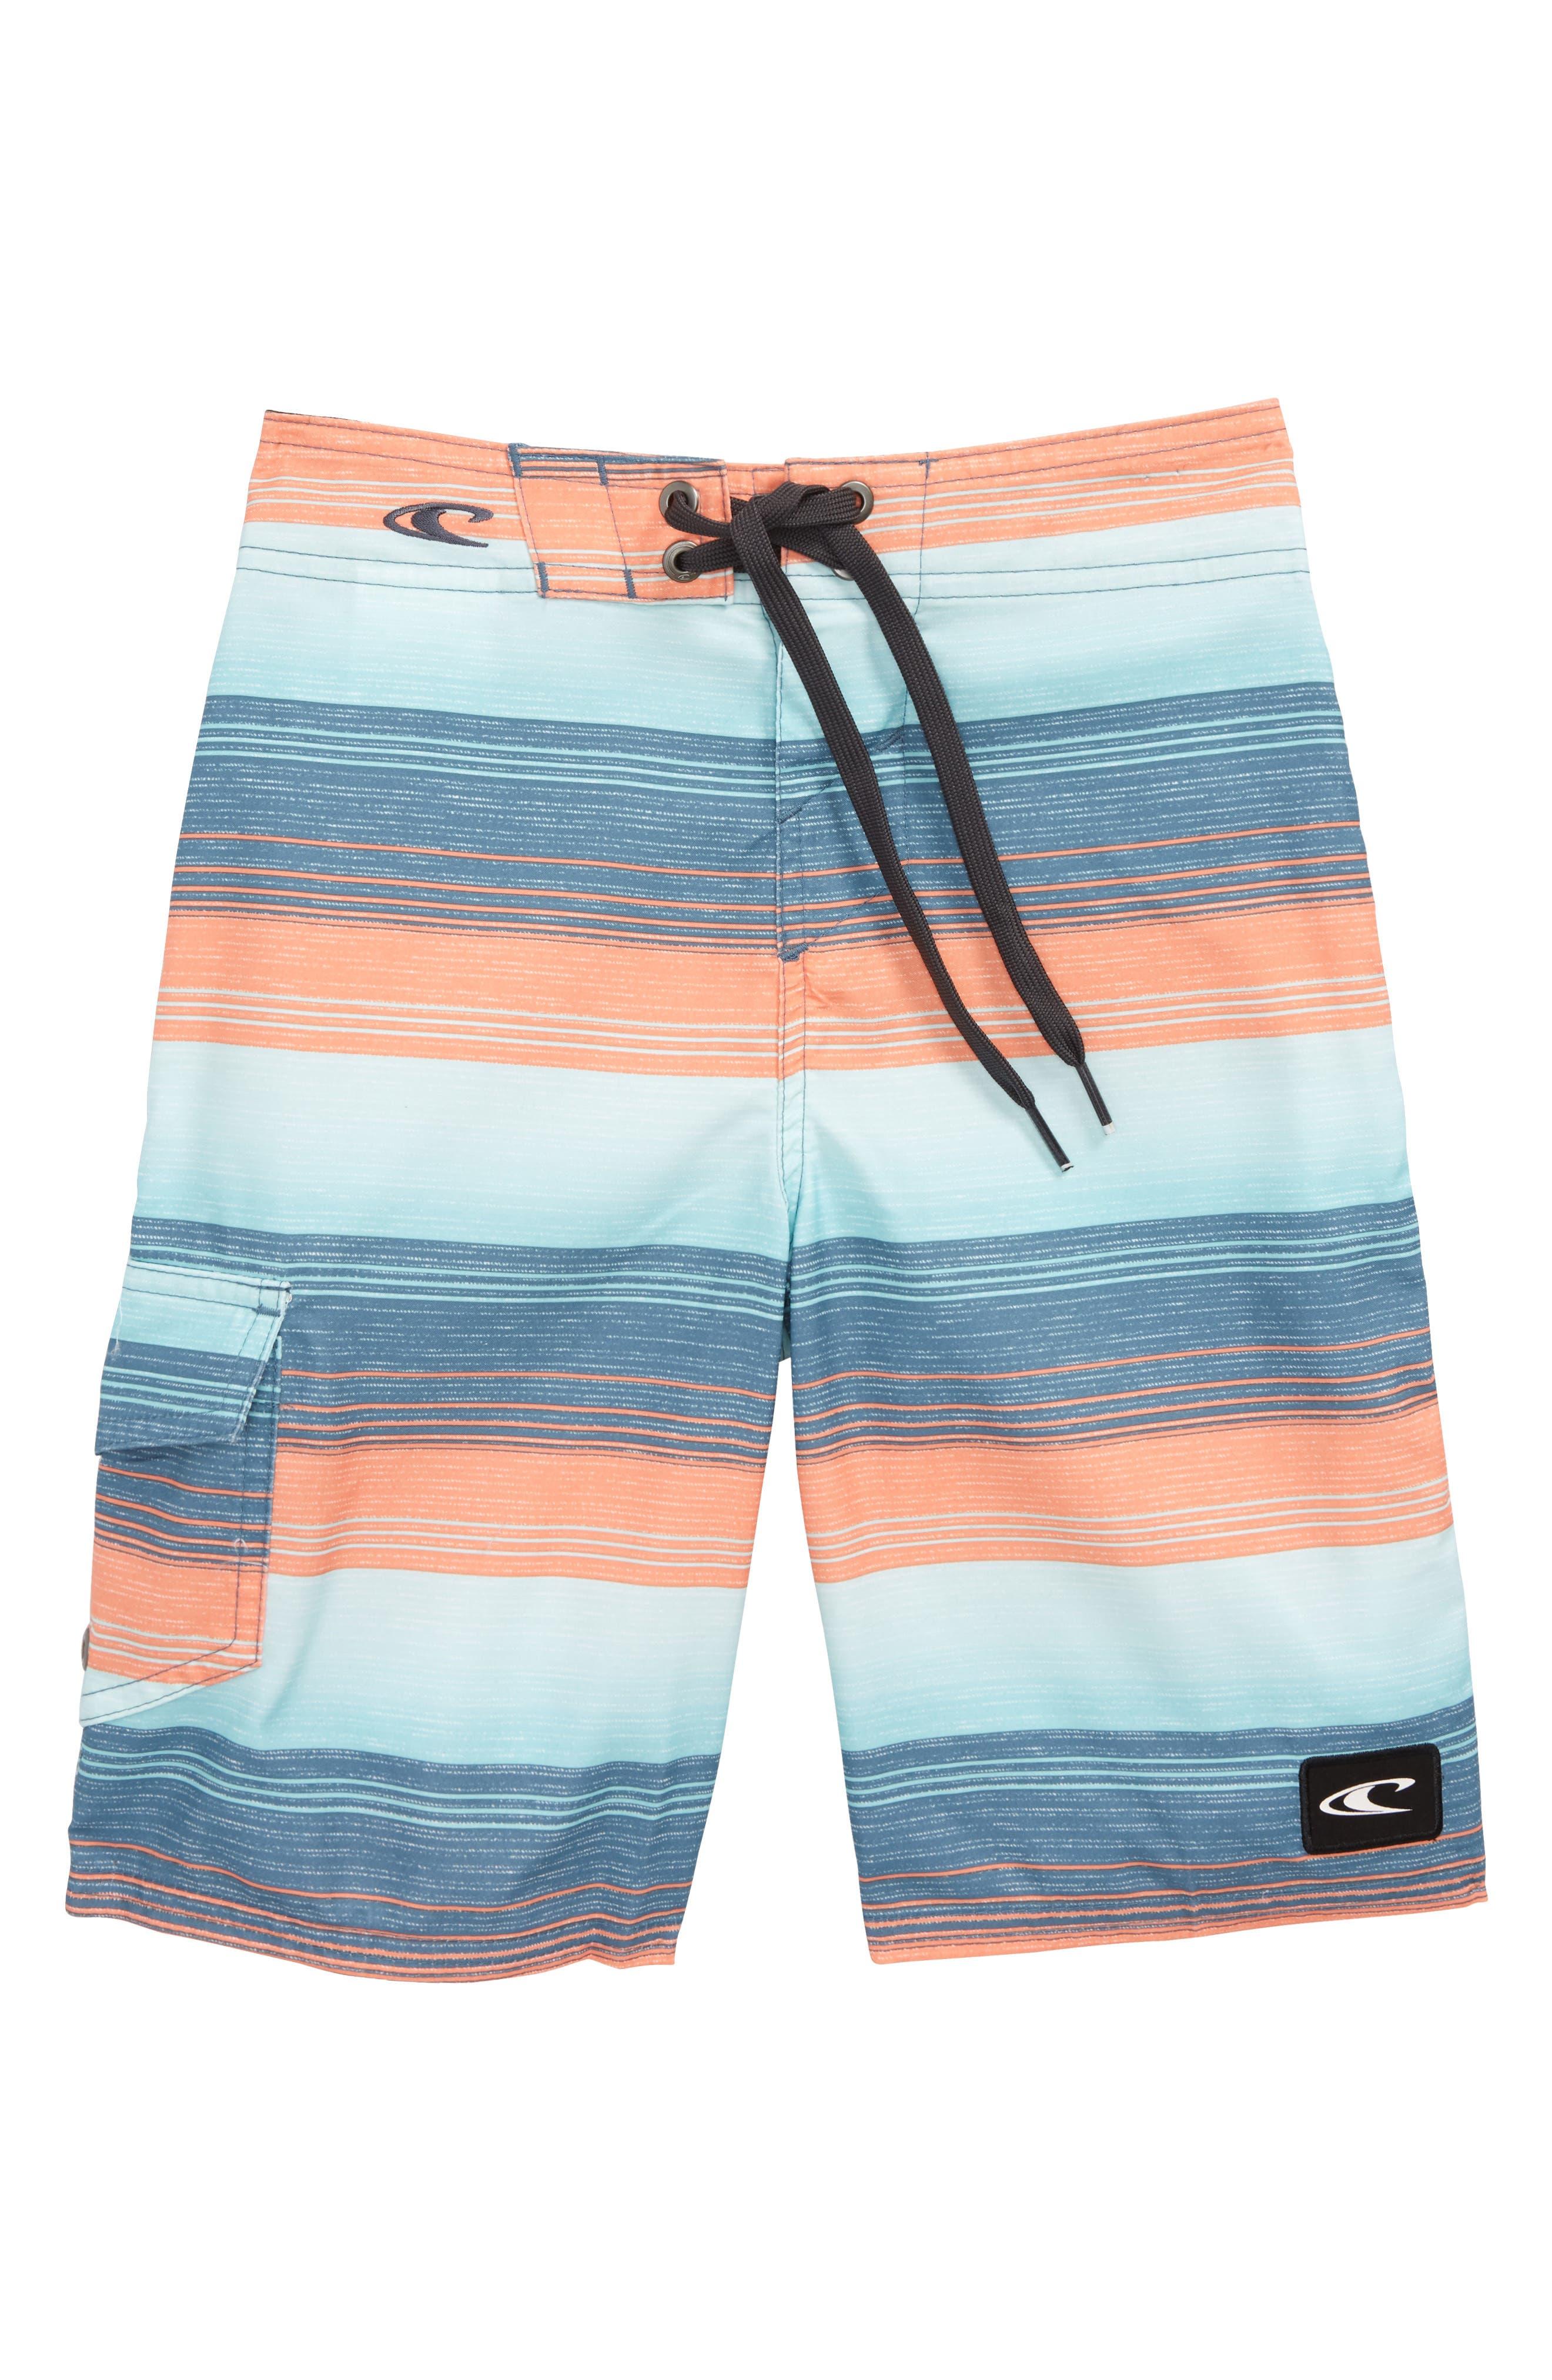 Alternate Image 1 Selected - O'Neill Santa Cruz Stripe Board Shorts (Big Boys)